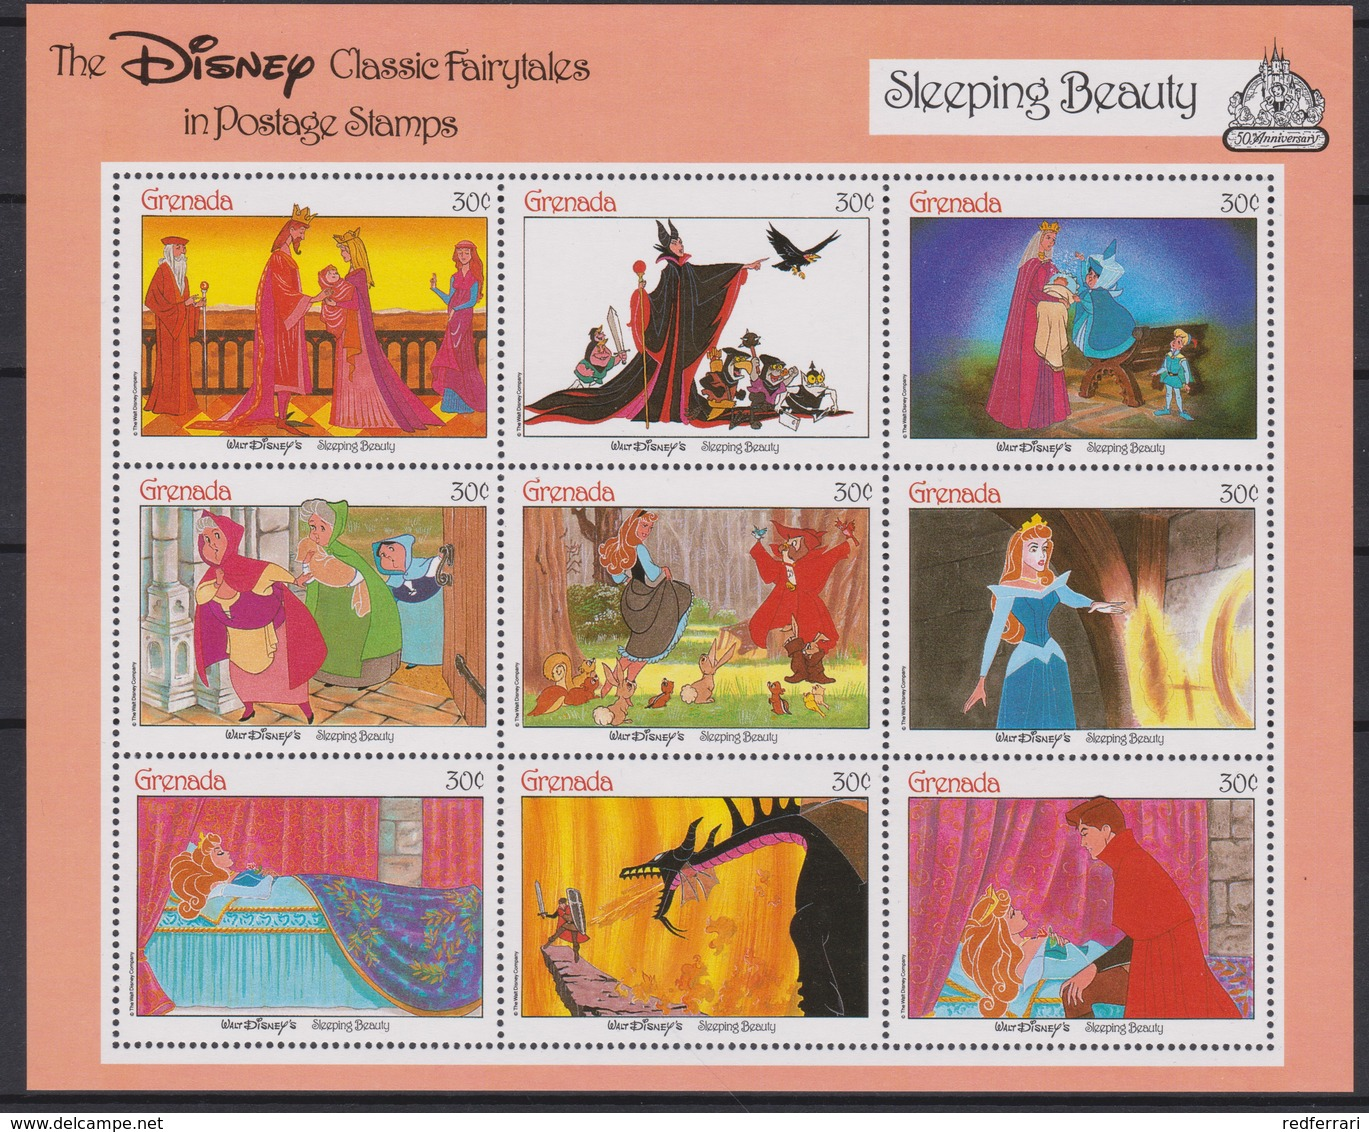 2228  WALT DISNEY - GRANADA ( The Disney Classic Fairytales In Postage Stamps ) Snow White / Peter Pan . - Disney